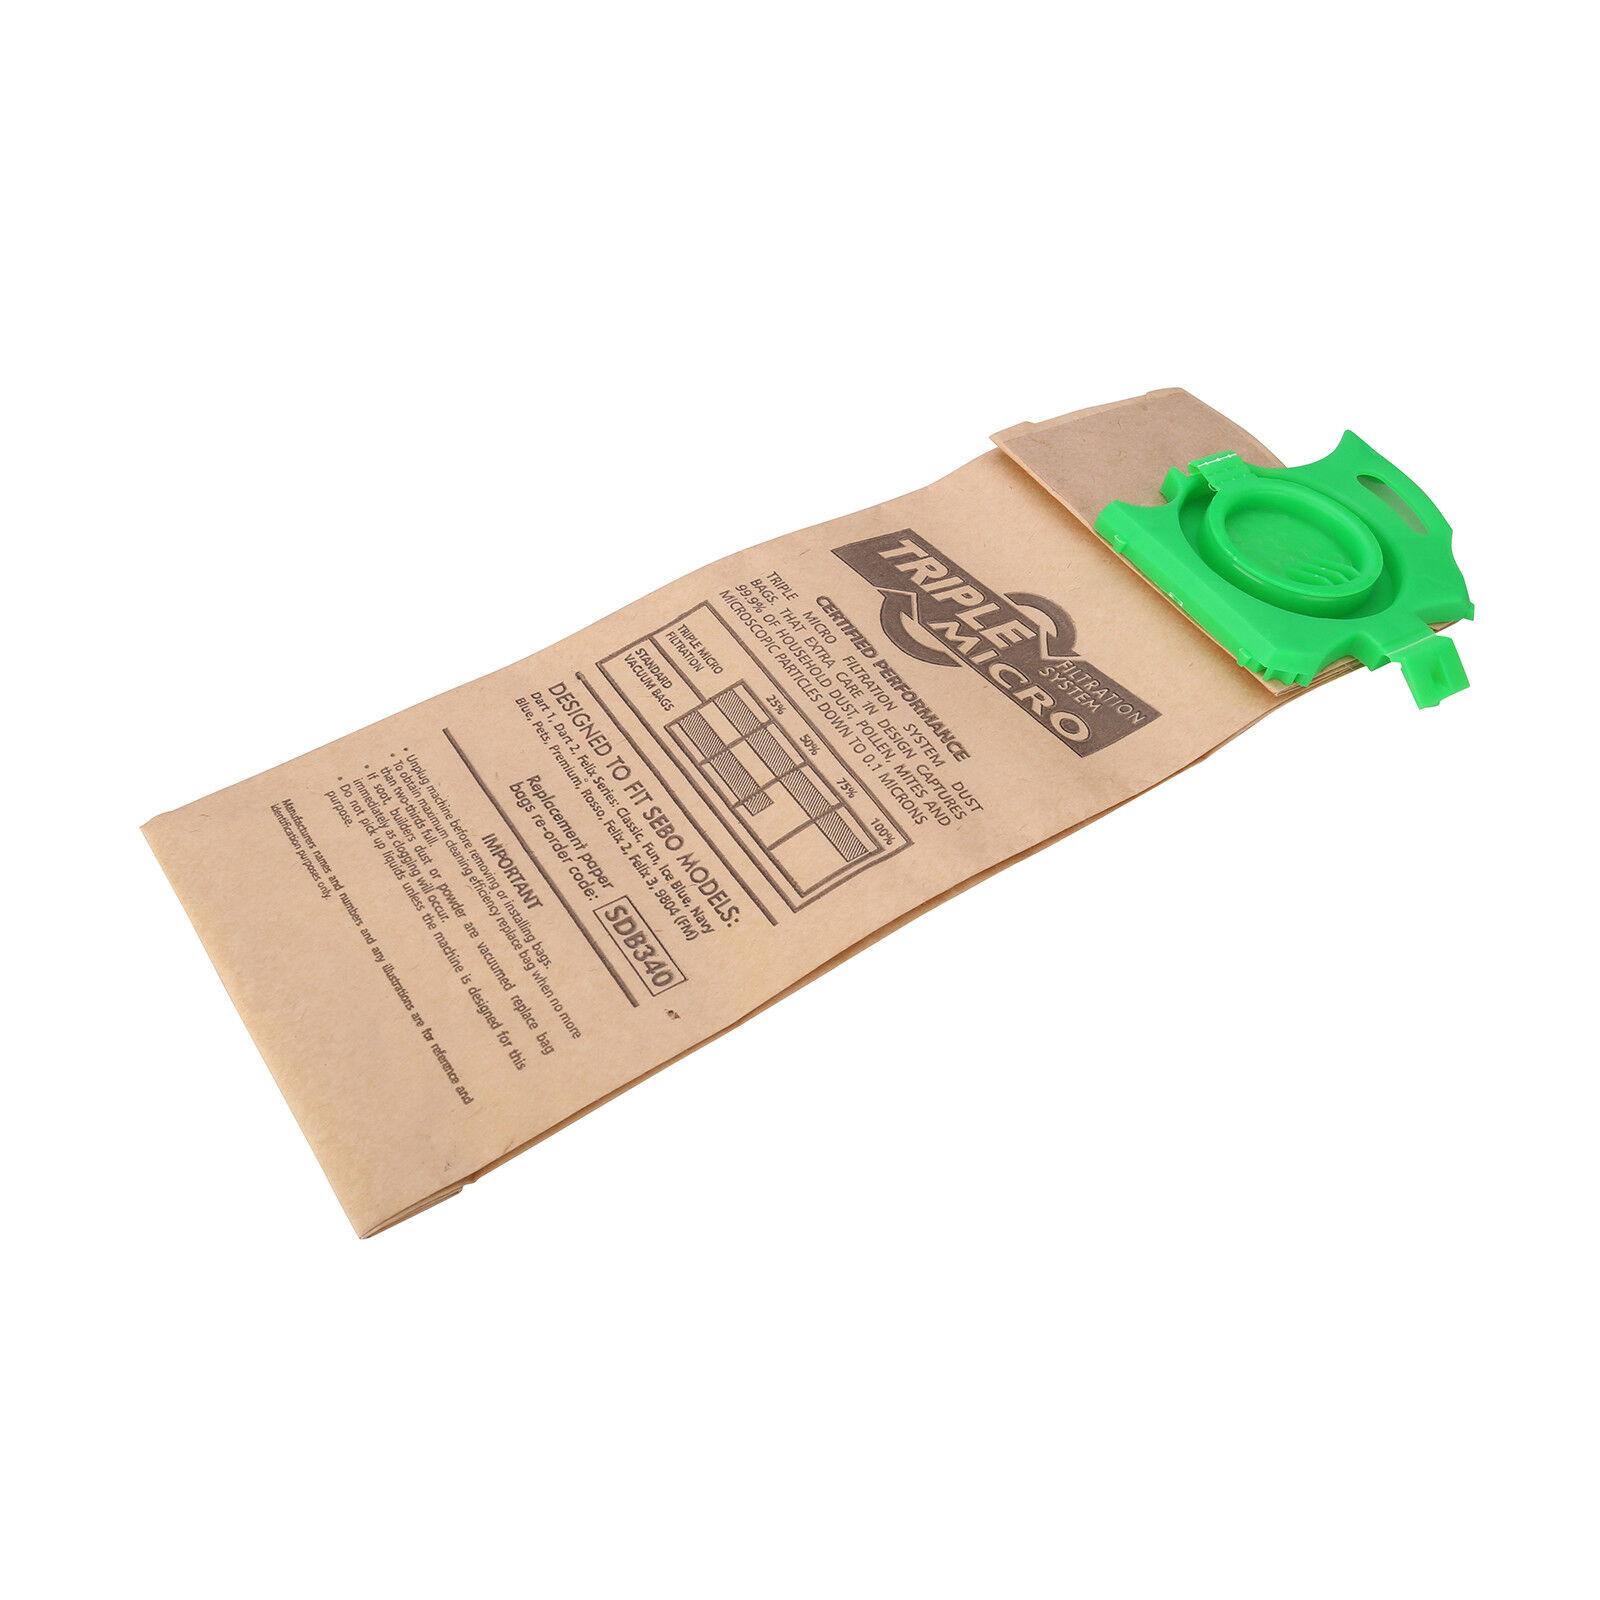 Sebo Dart //Felix Vacuum Cleaner Bags x 20 Genuine 4010 Cleaning Janitorial